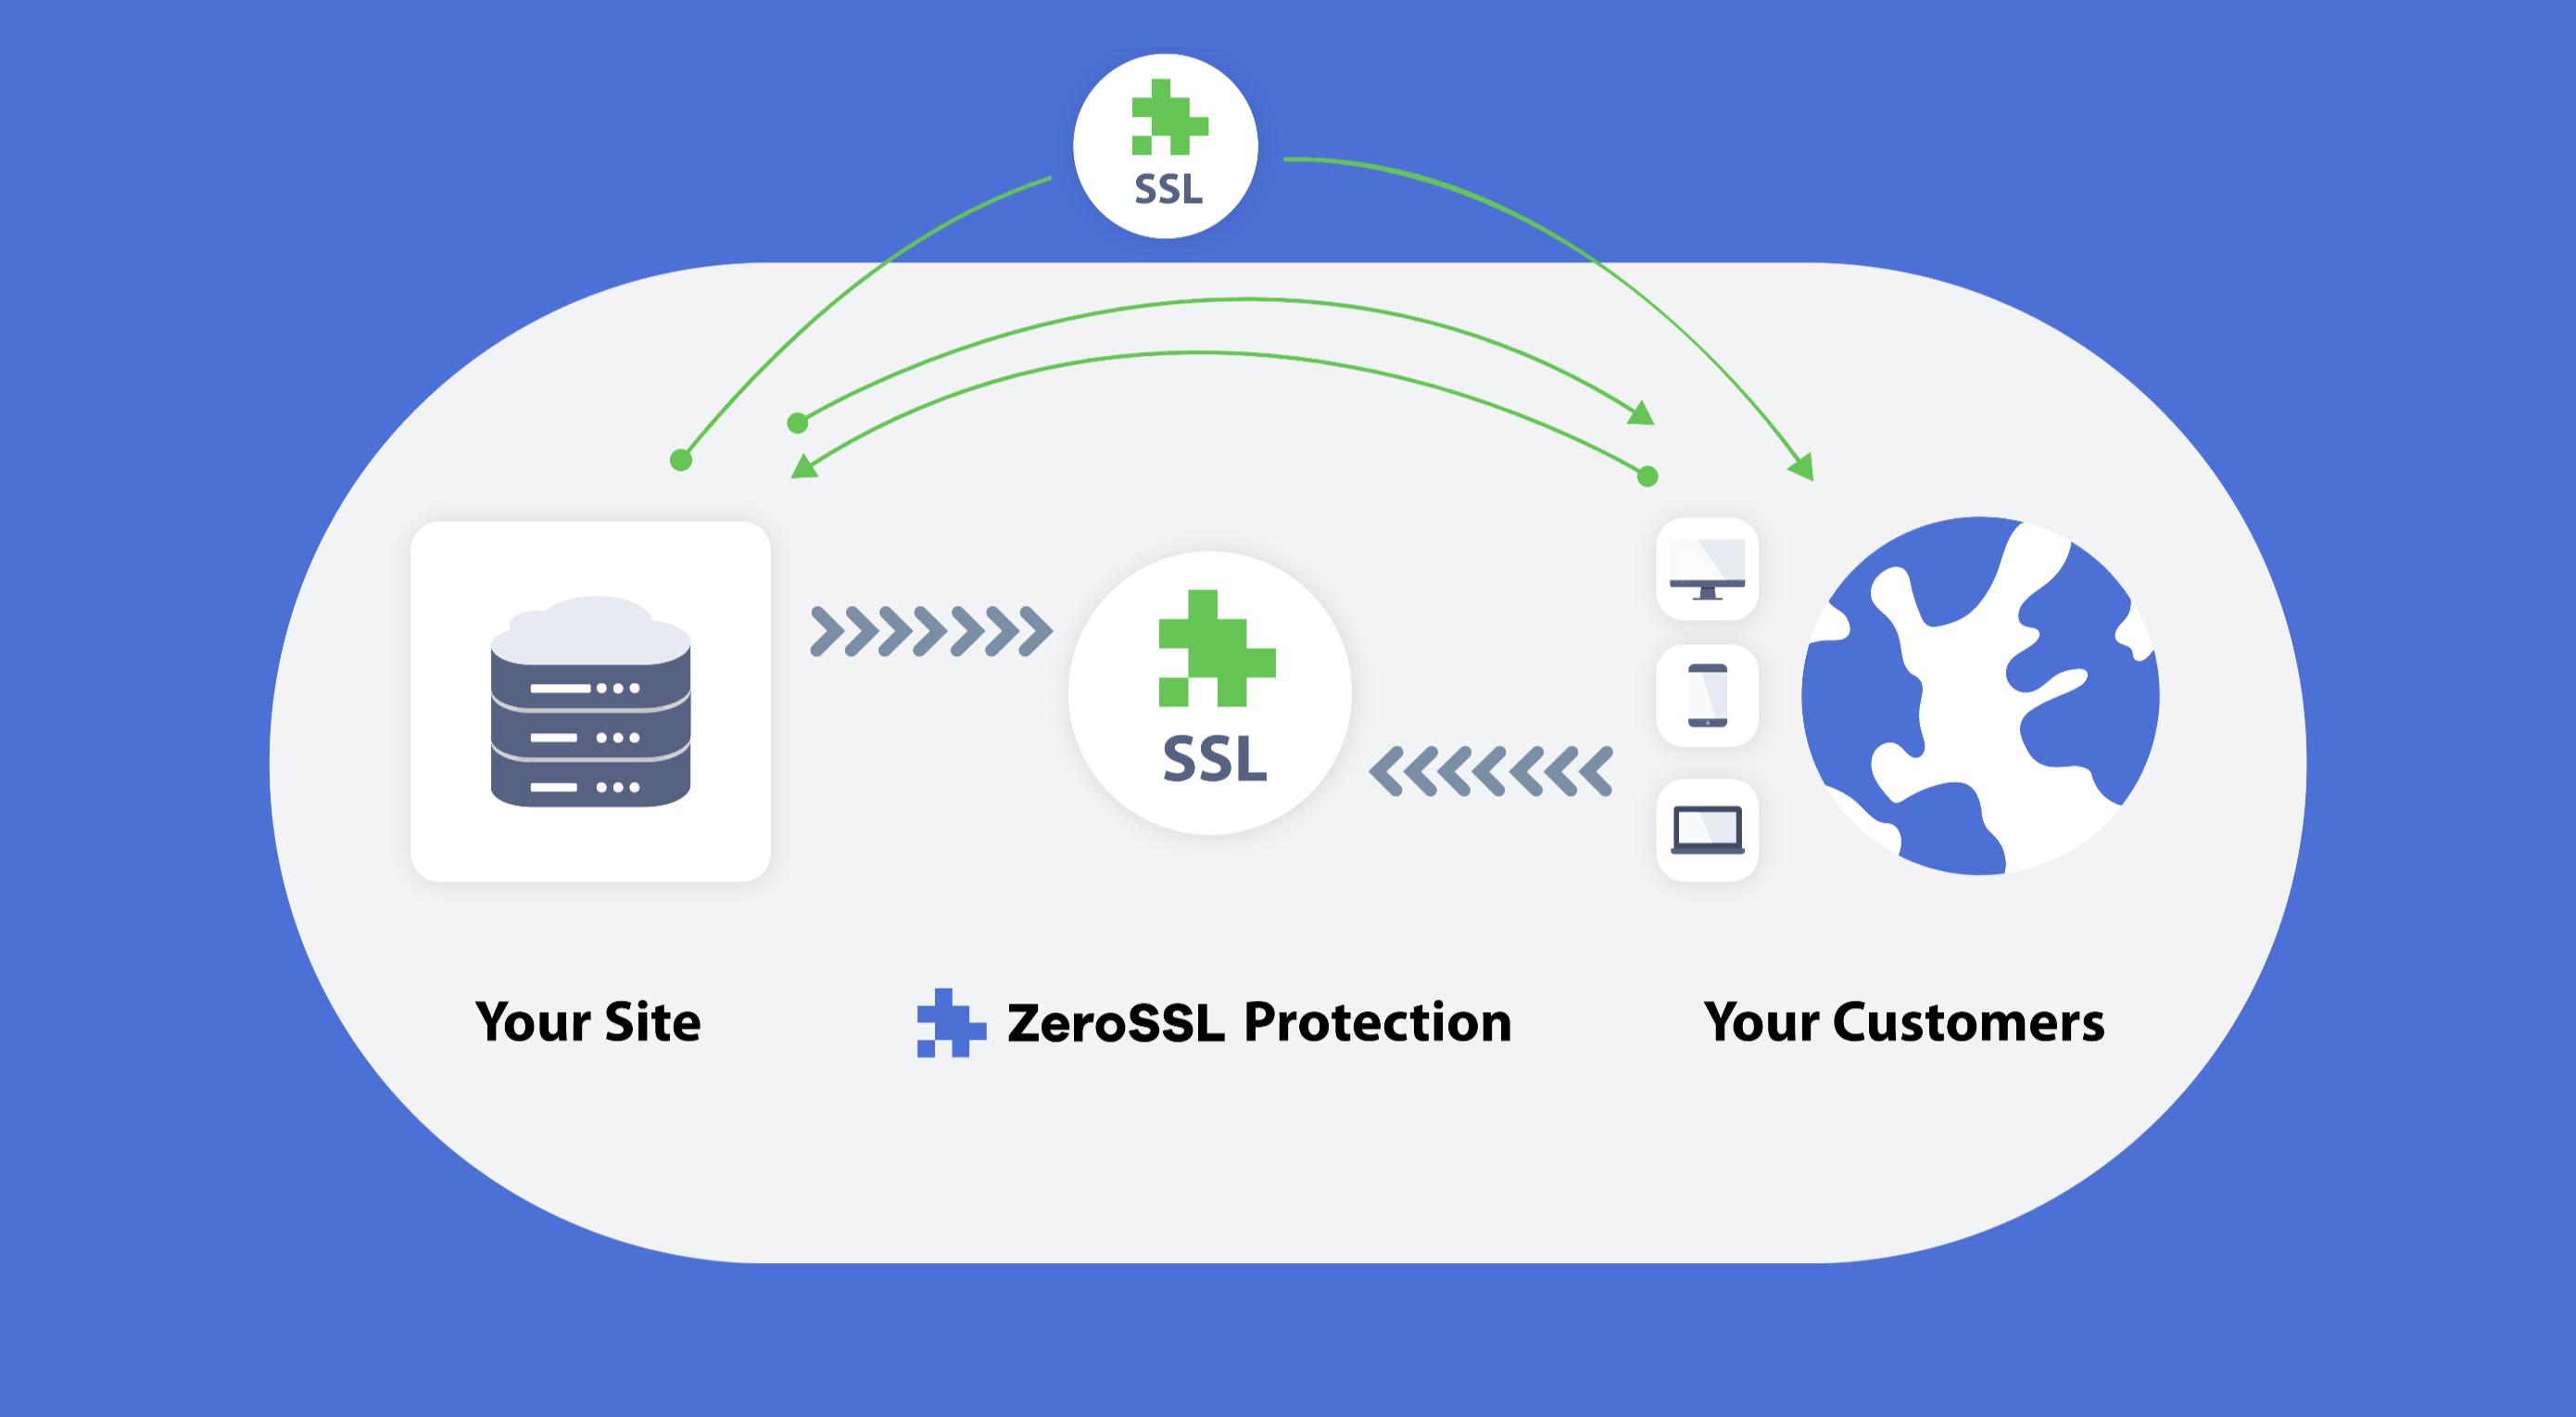 Grab Free SSL Certificates From ZeroSSL